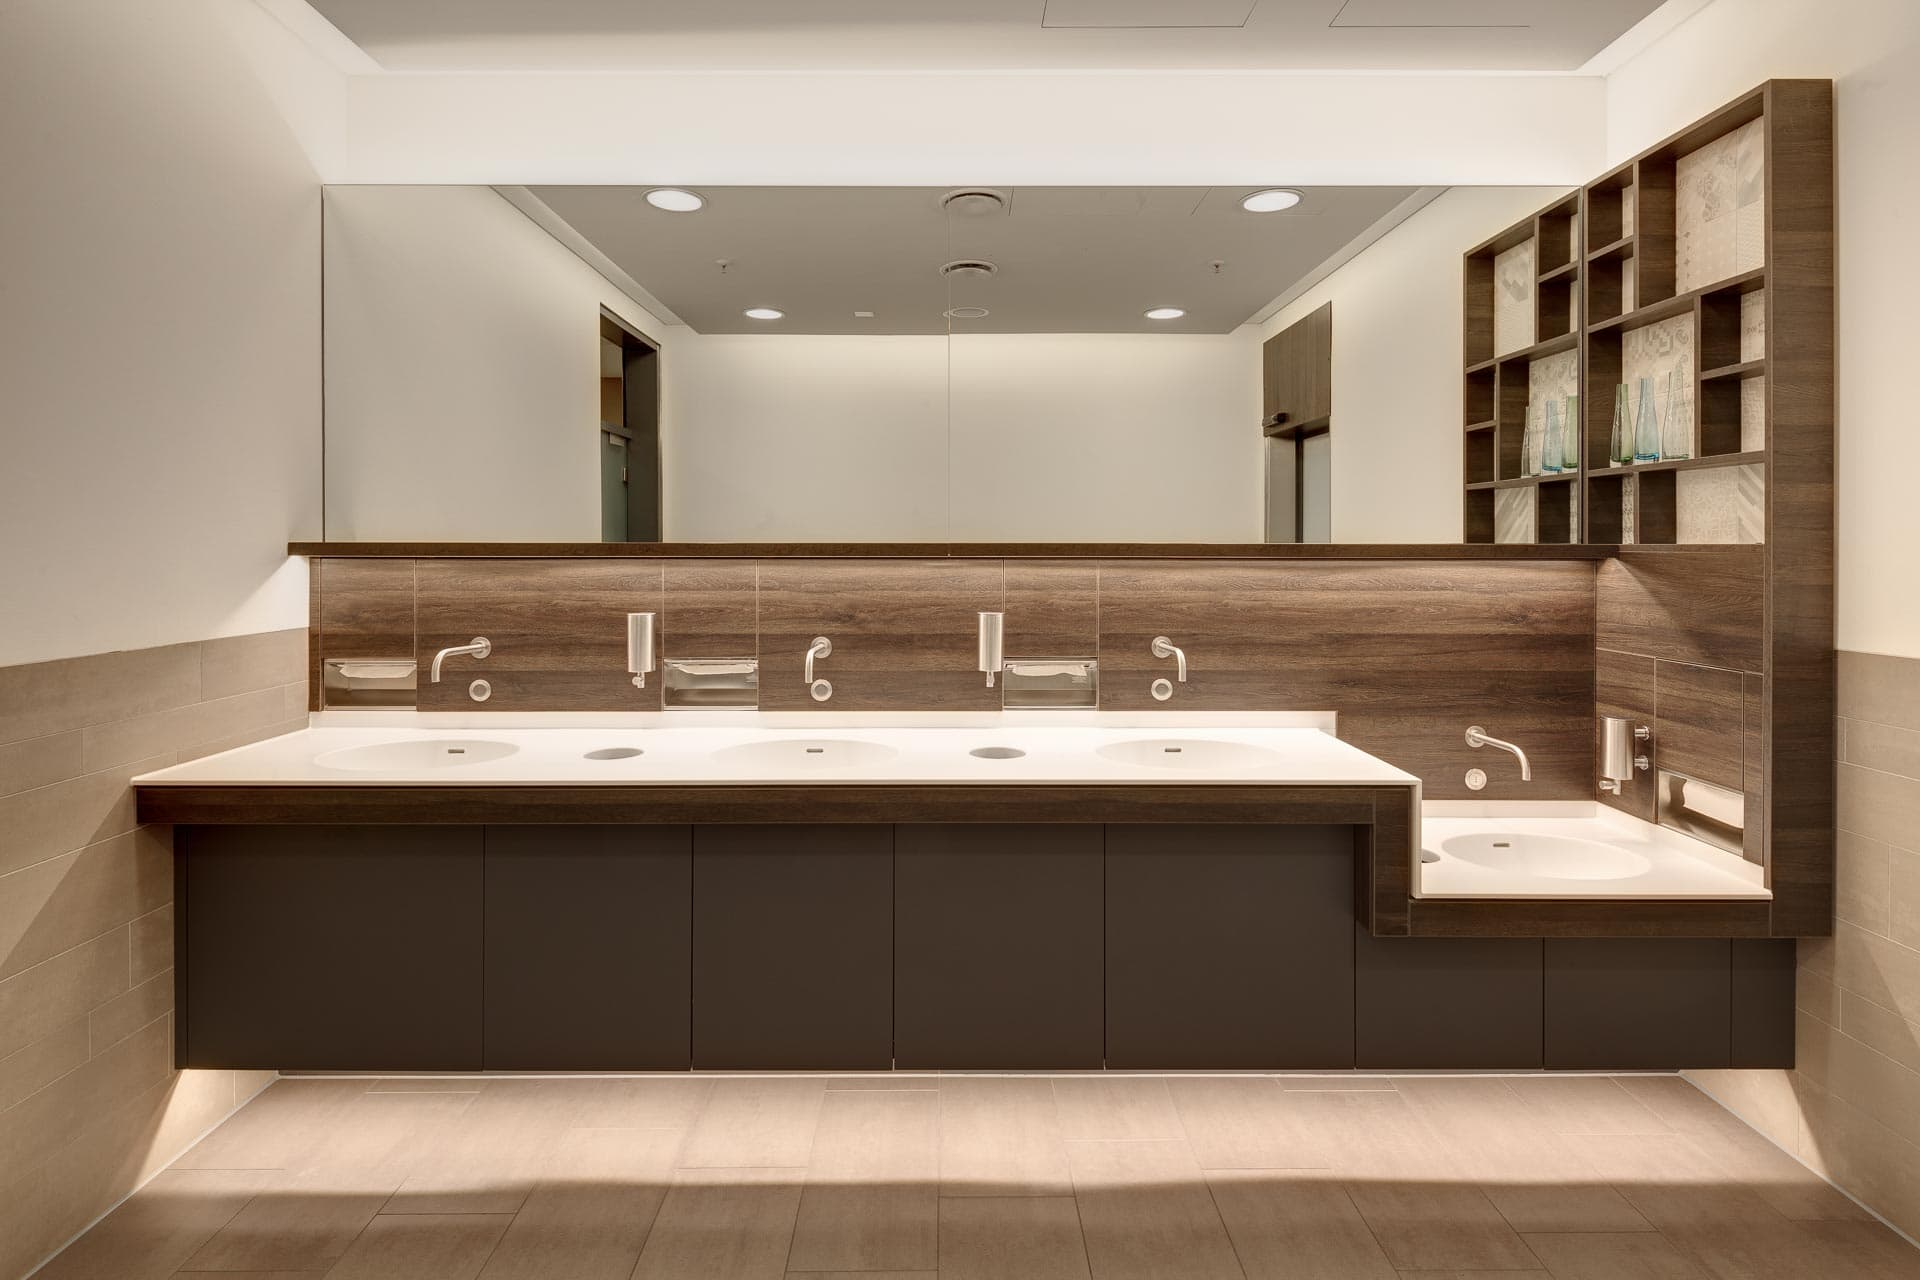 Kunden-WC im Breuningerland. Design: andOFFICE.